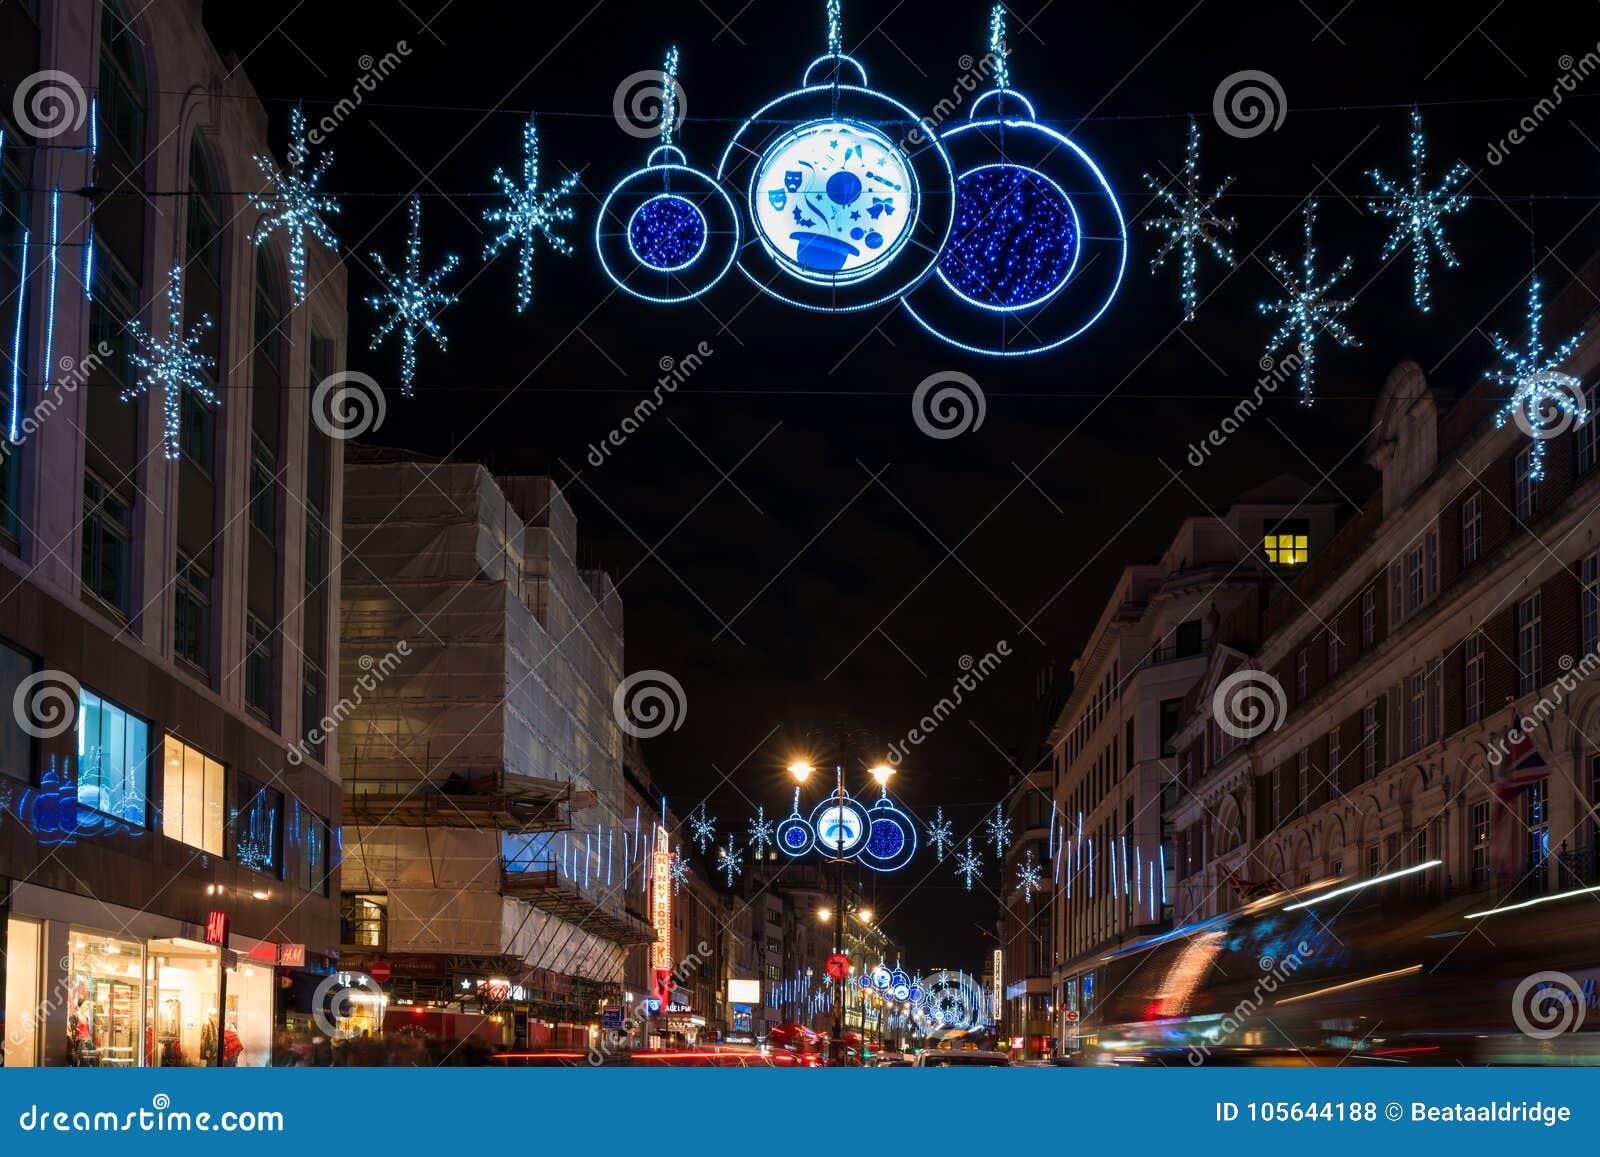 Christmas decorations on The Strand, London UK